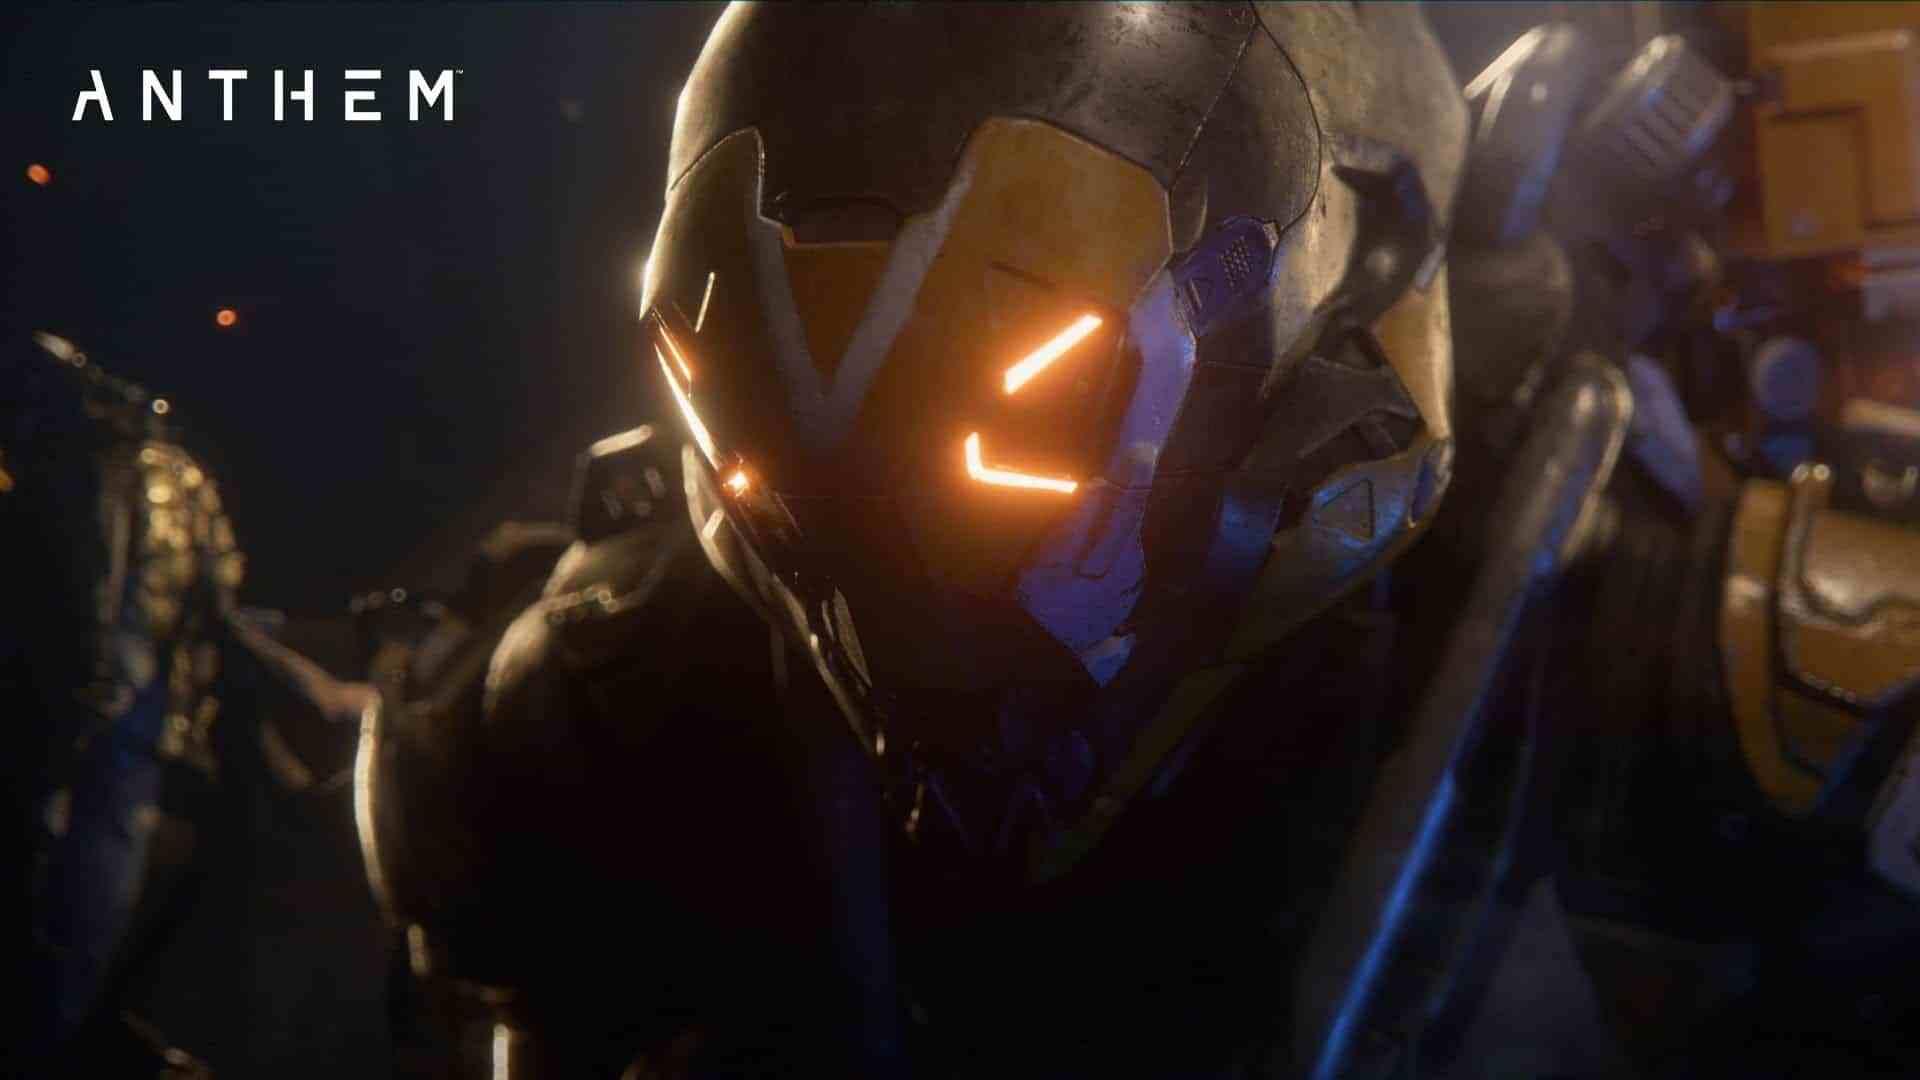 EA continua imperterrita ad affossare Anthem e alienare i giocatori